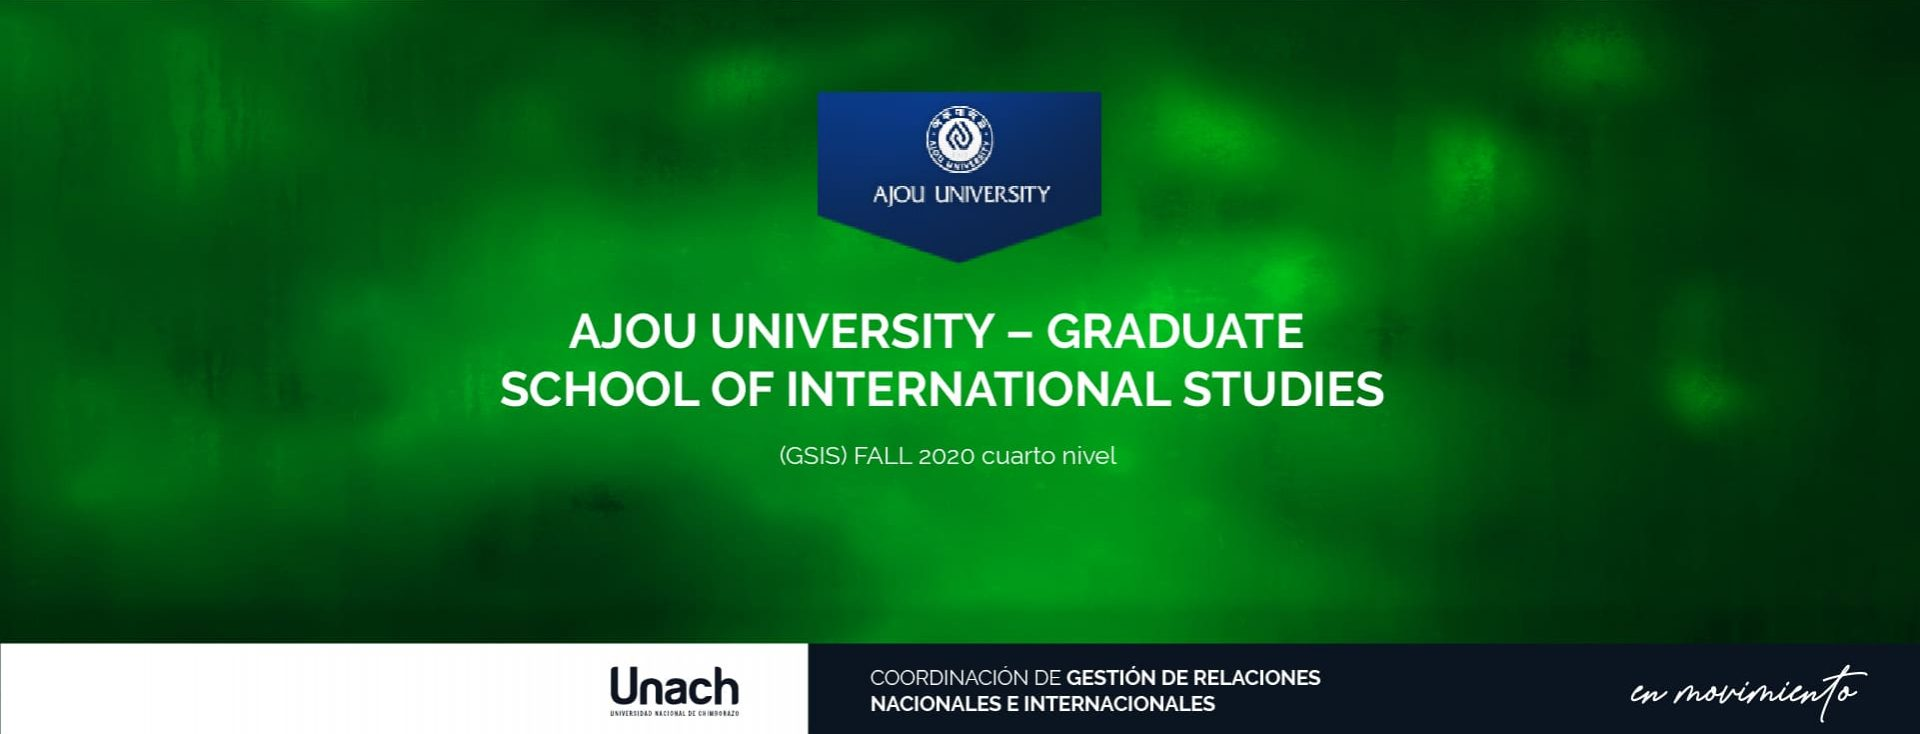 AJOU UNIVERSITY – GRADUATE SCHOOL OF INTERNATIONAL STUDIES (GSIS) FALL 2020 CUARTO NIVEL